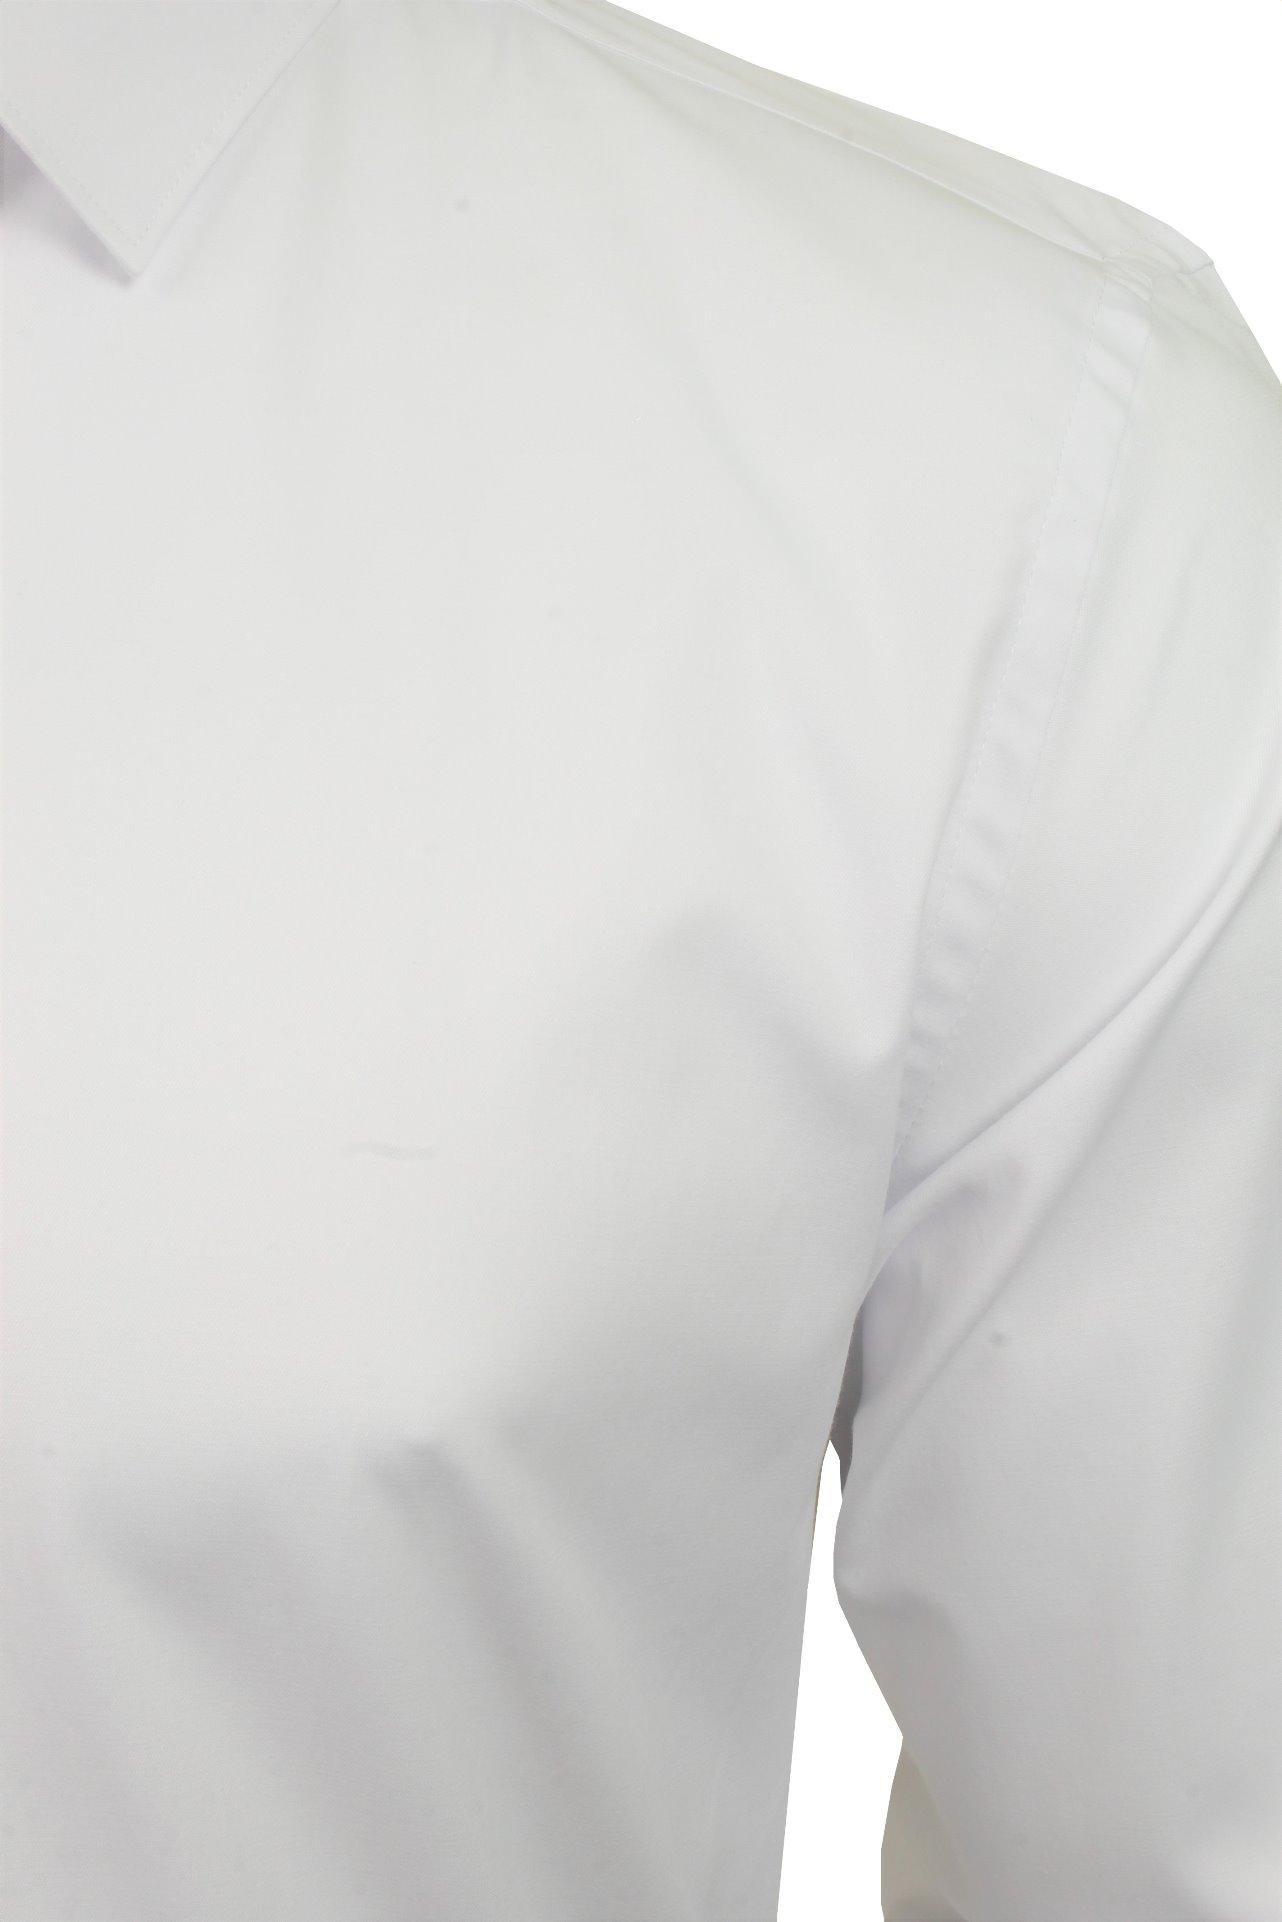 Xact-Mens-Long-Sleeved-Poplin-Stretch-Shirt-Slim-Fit miniatuur 13